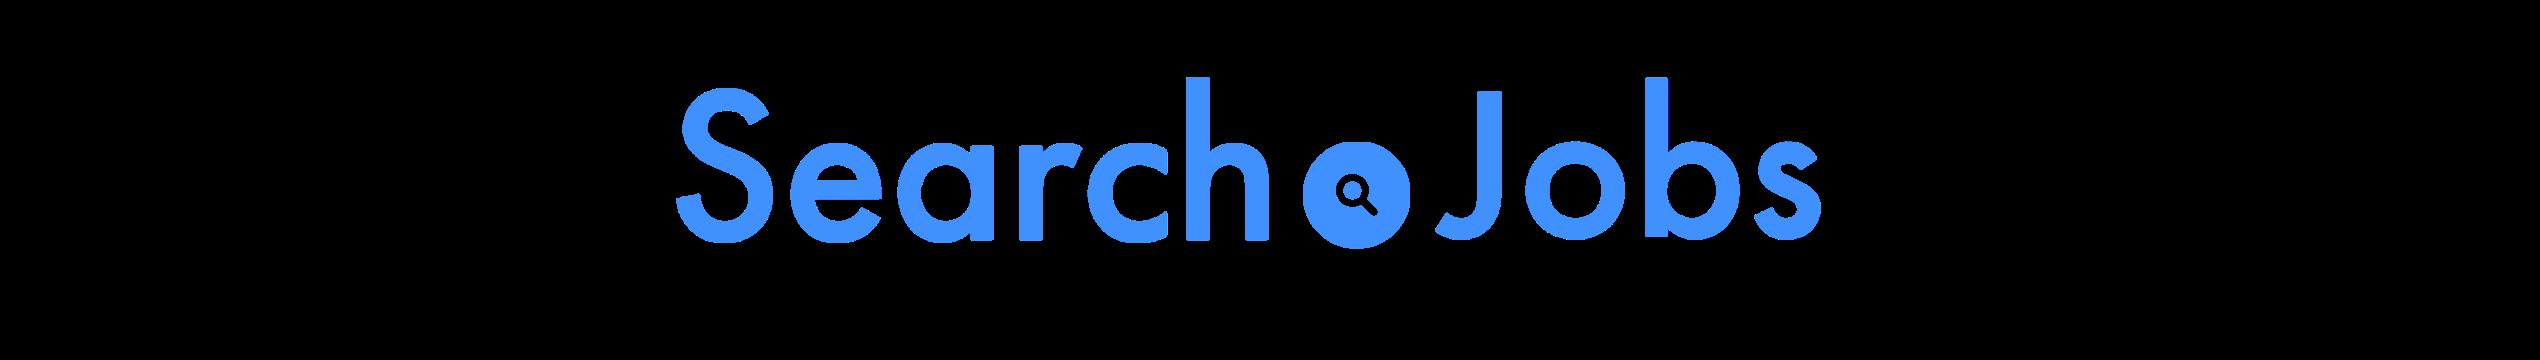 search.jobs logo